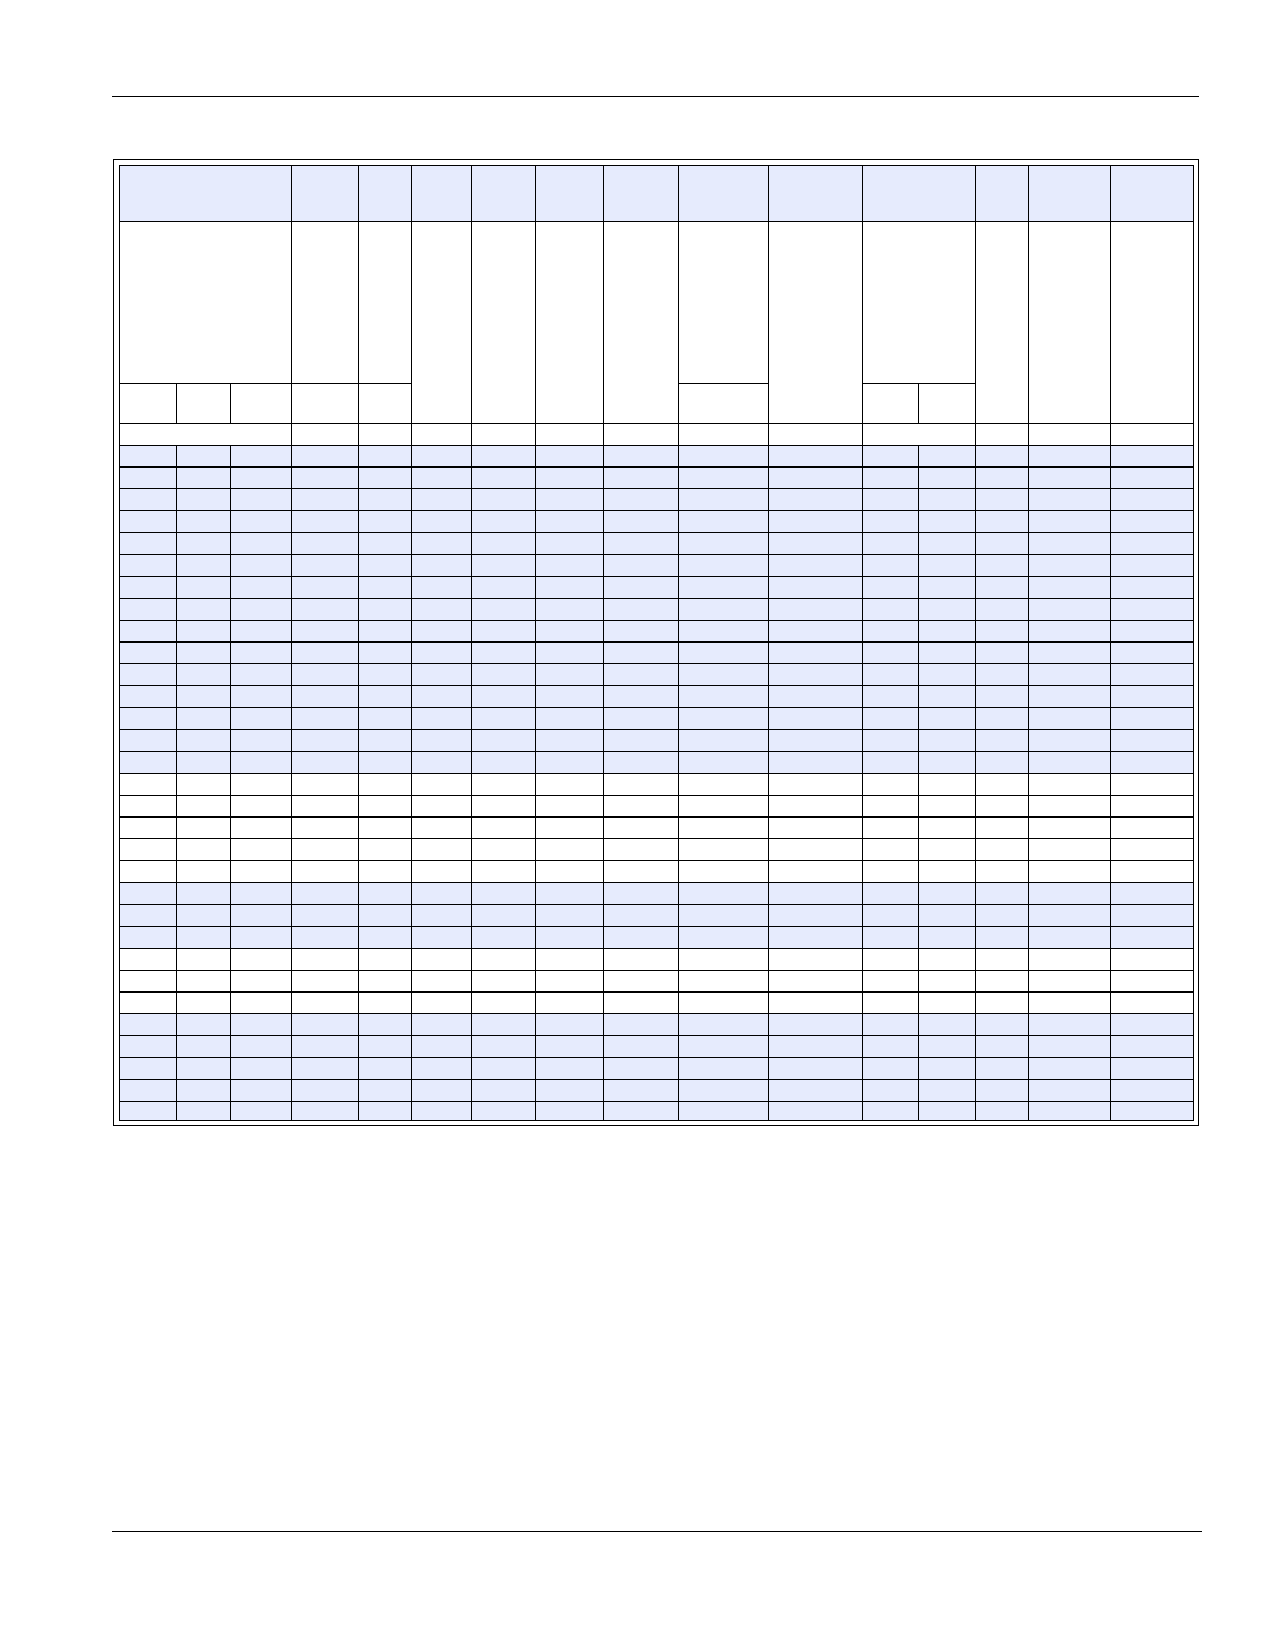 Q2006LH4 pdf